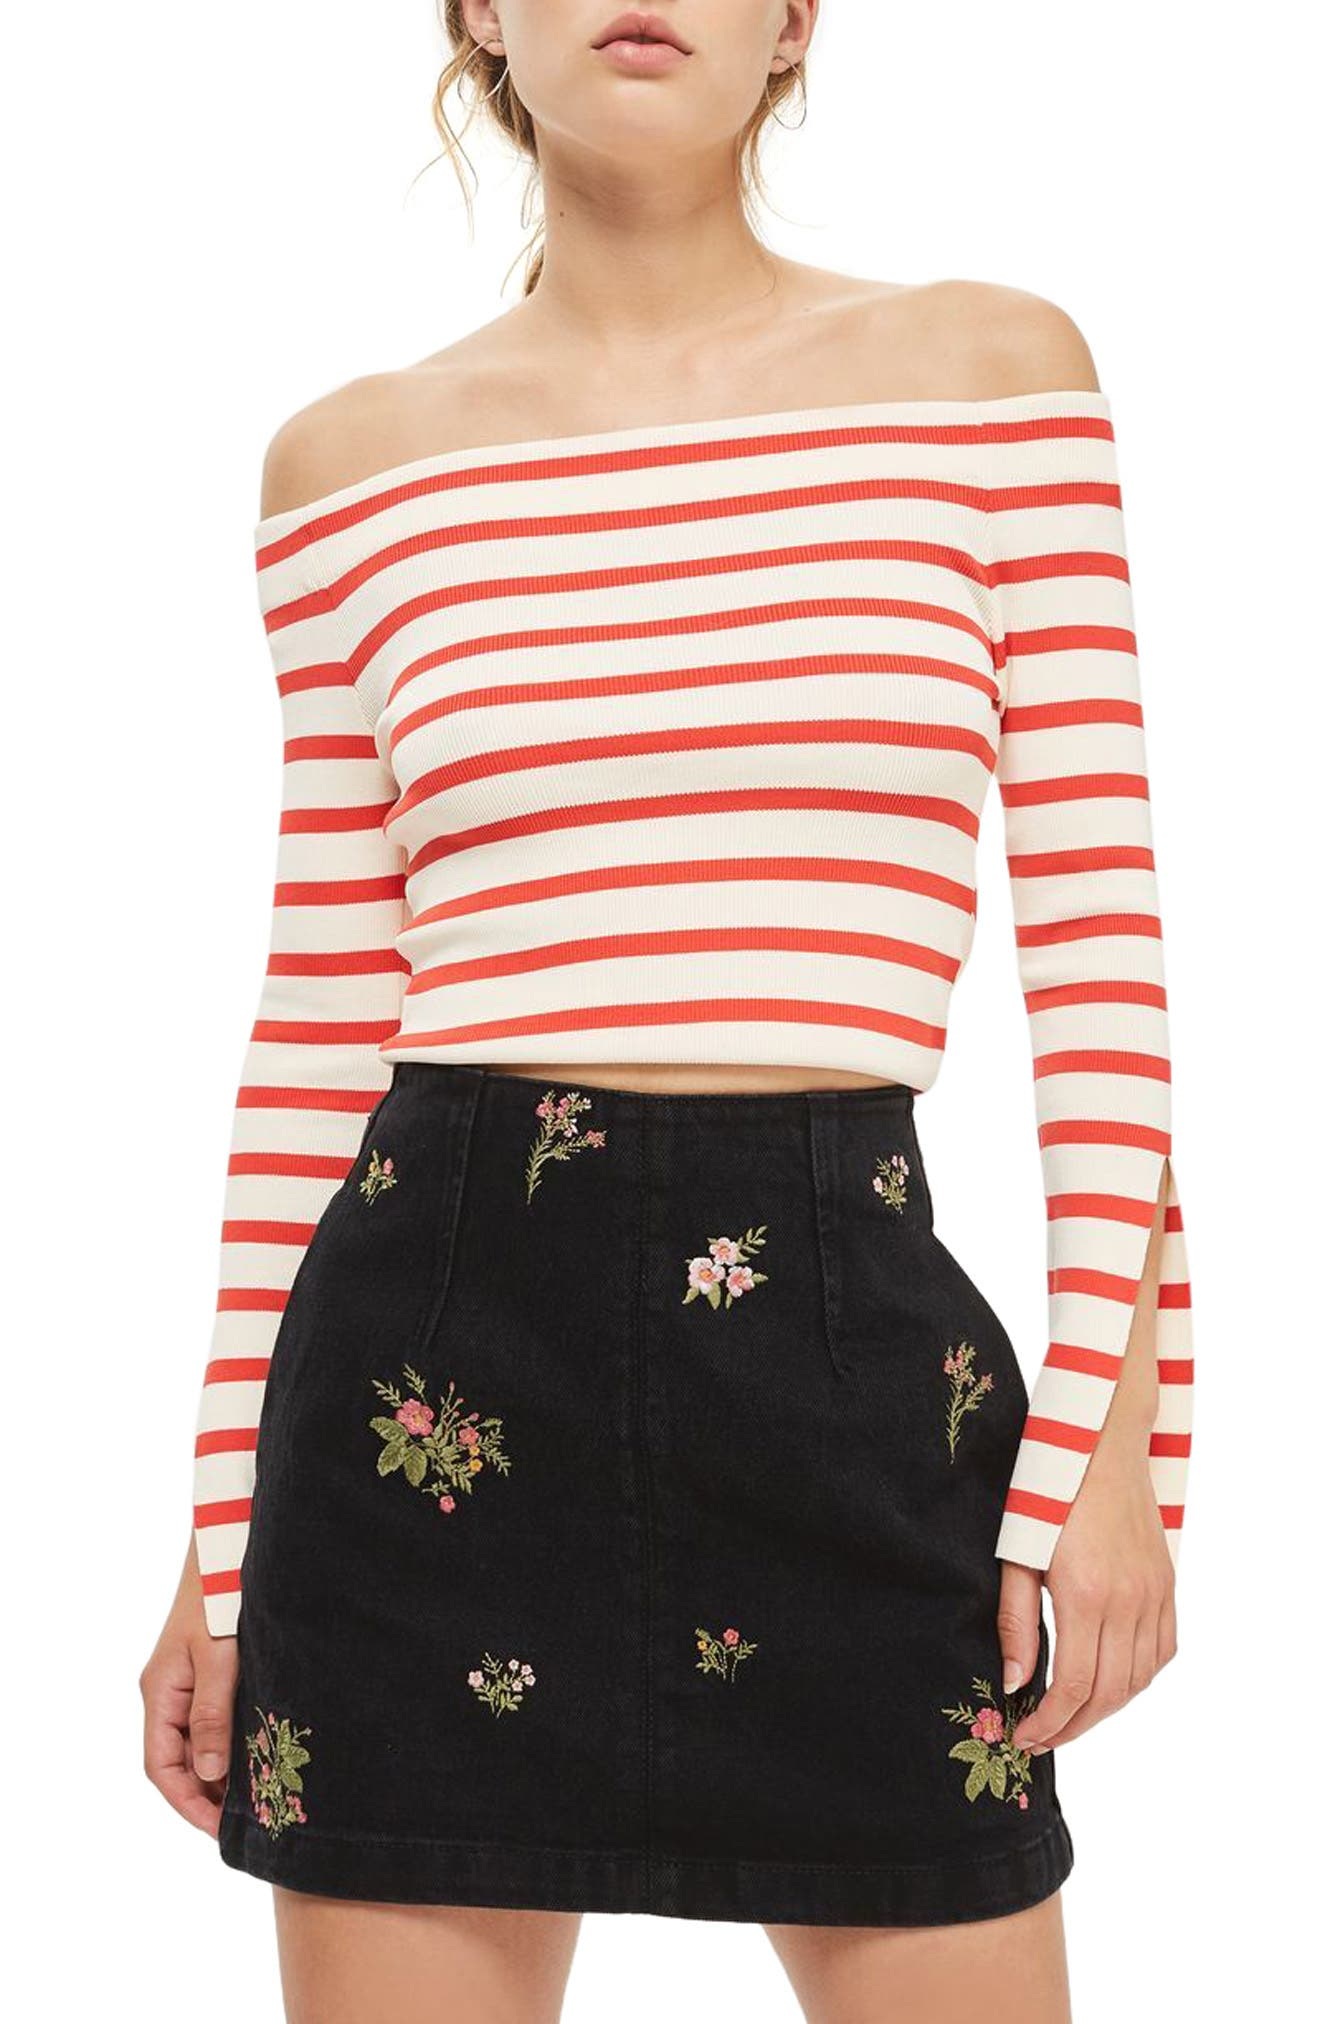 Topshop Romantic Floral Denim Miniskirt